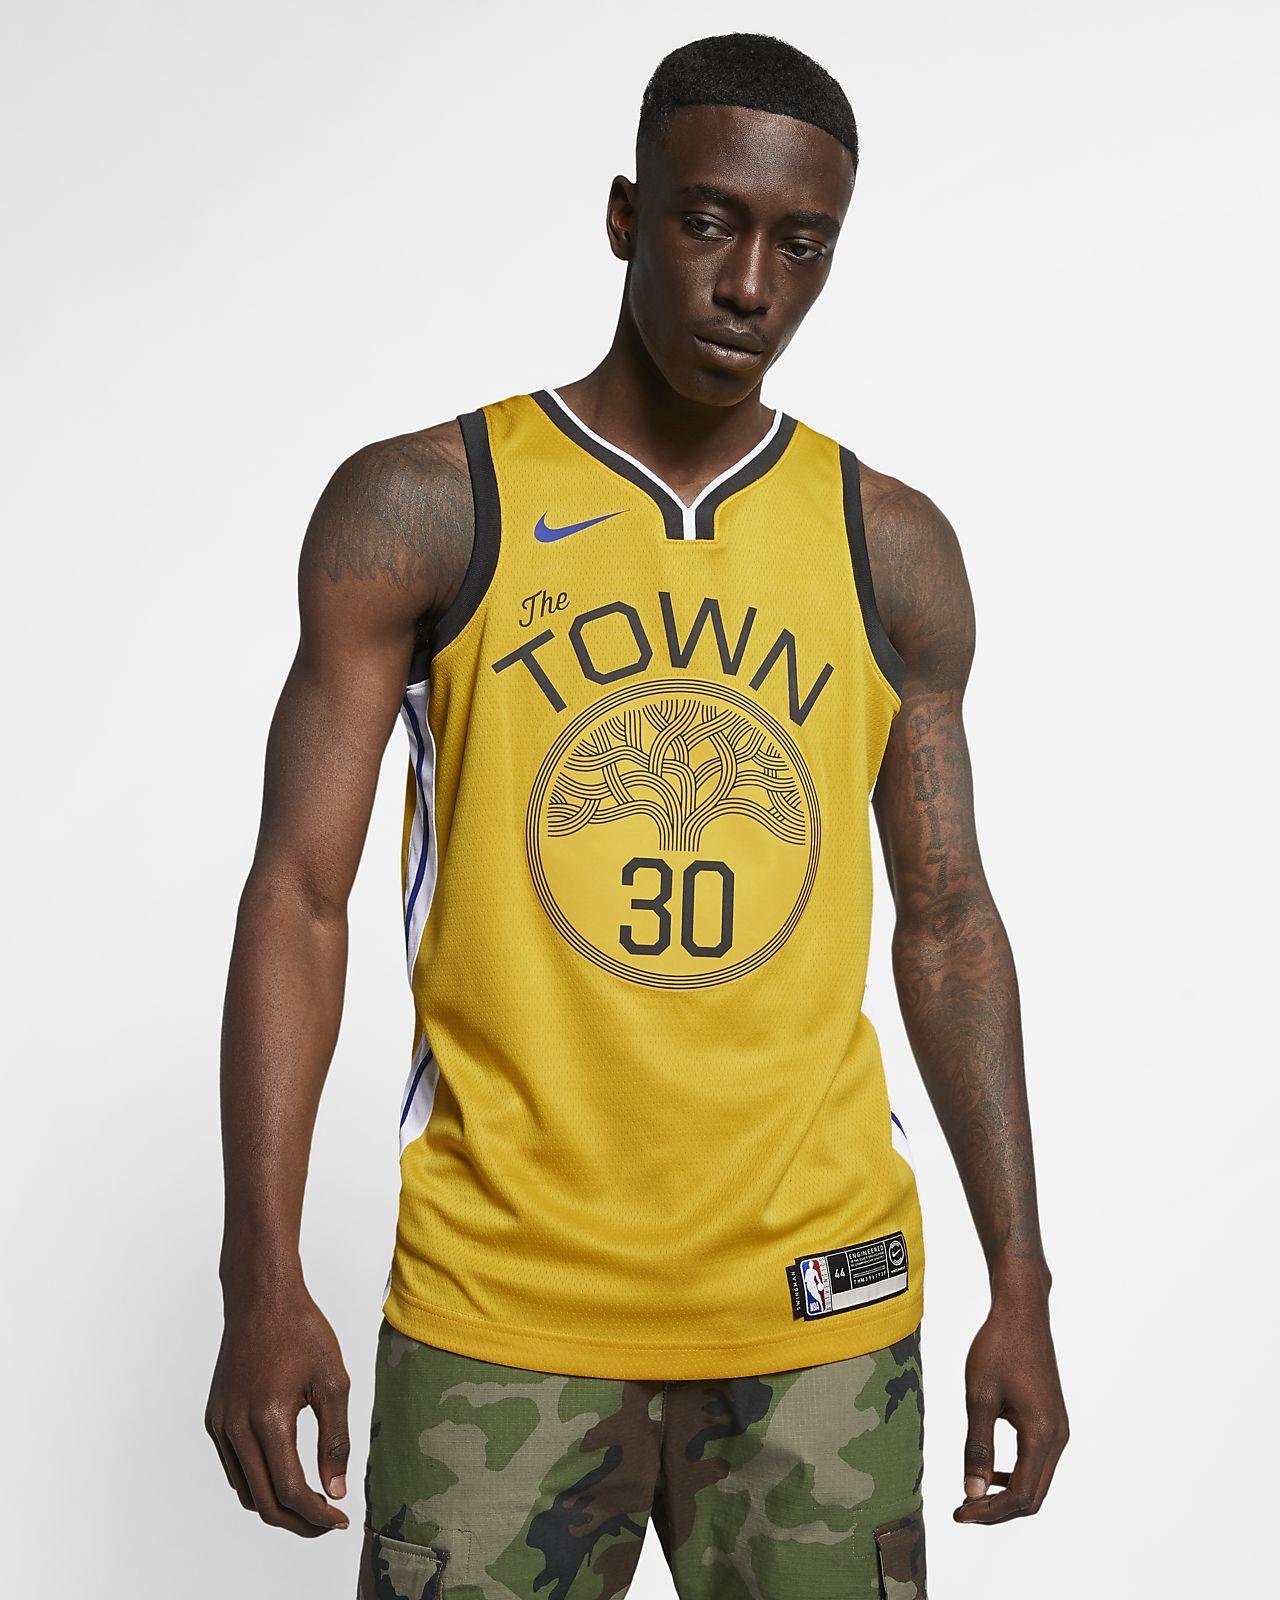 2019 Nuovo prodotto Nike Performance uomo NBA GOLDEN STATE